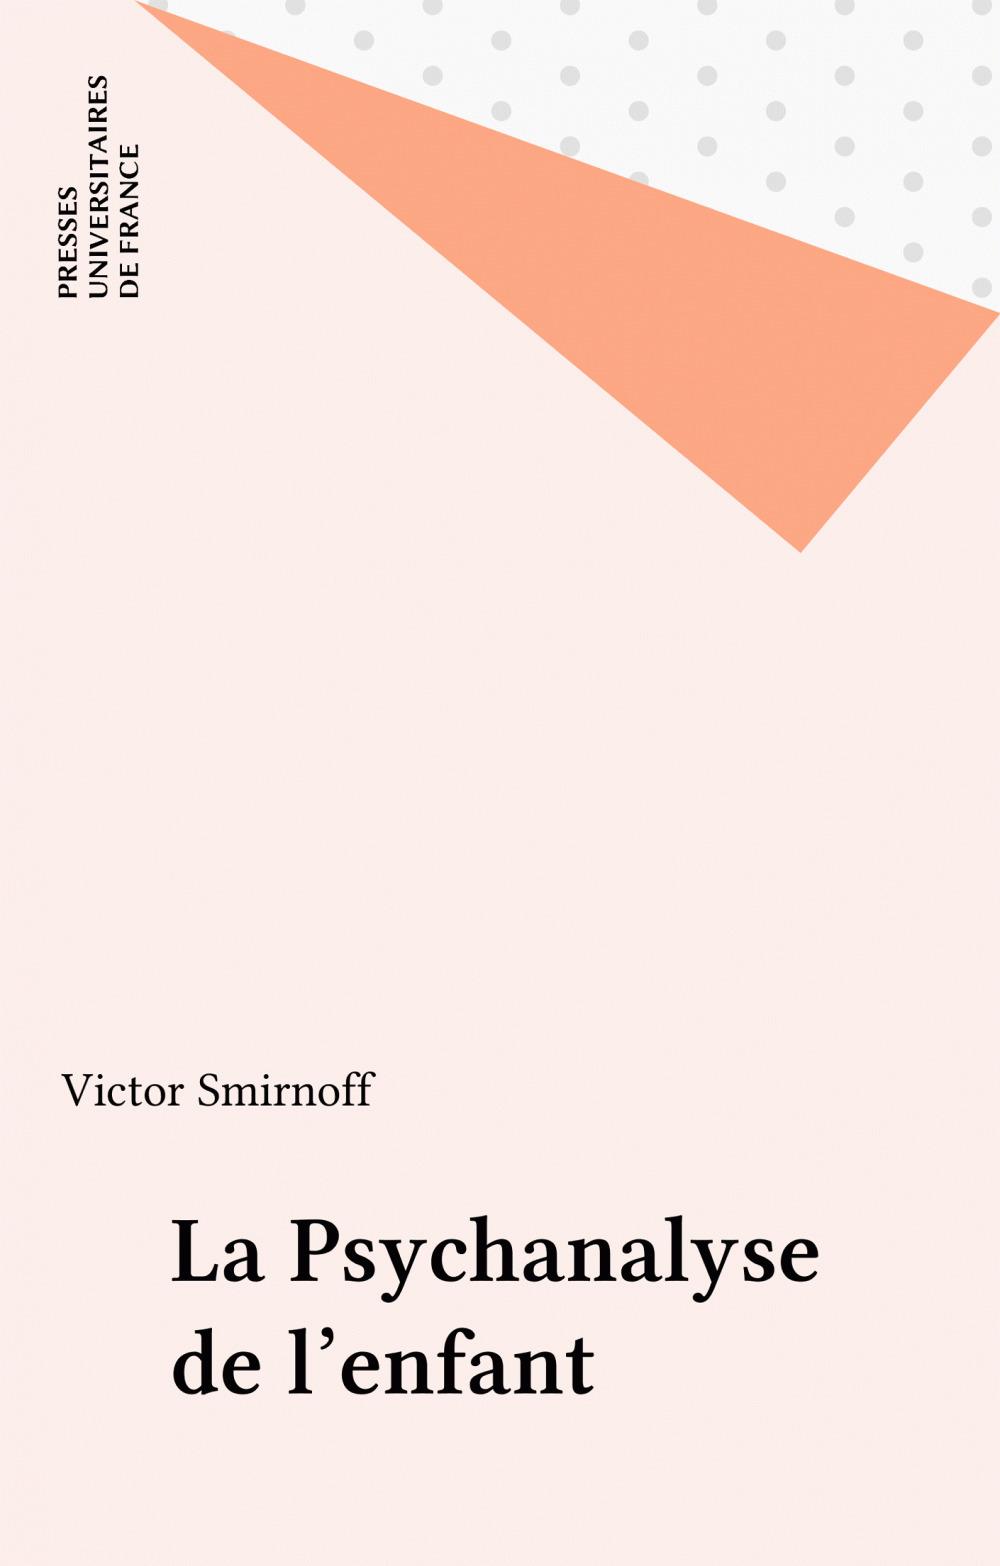 La Psychanalyse de l'enfant